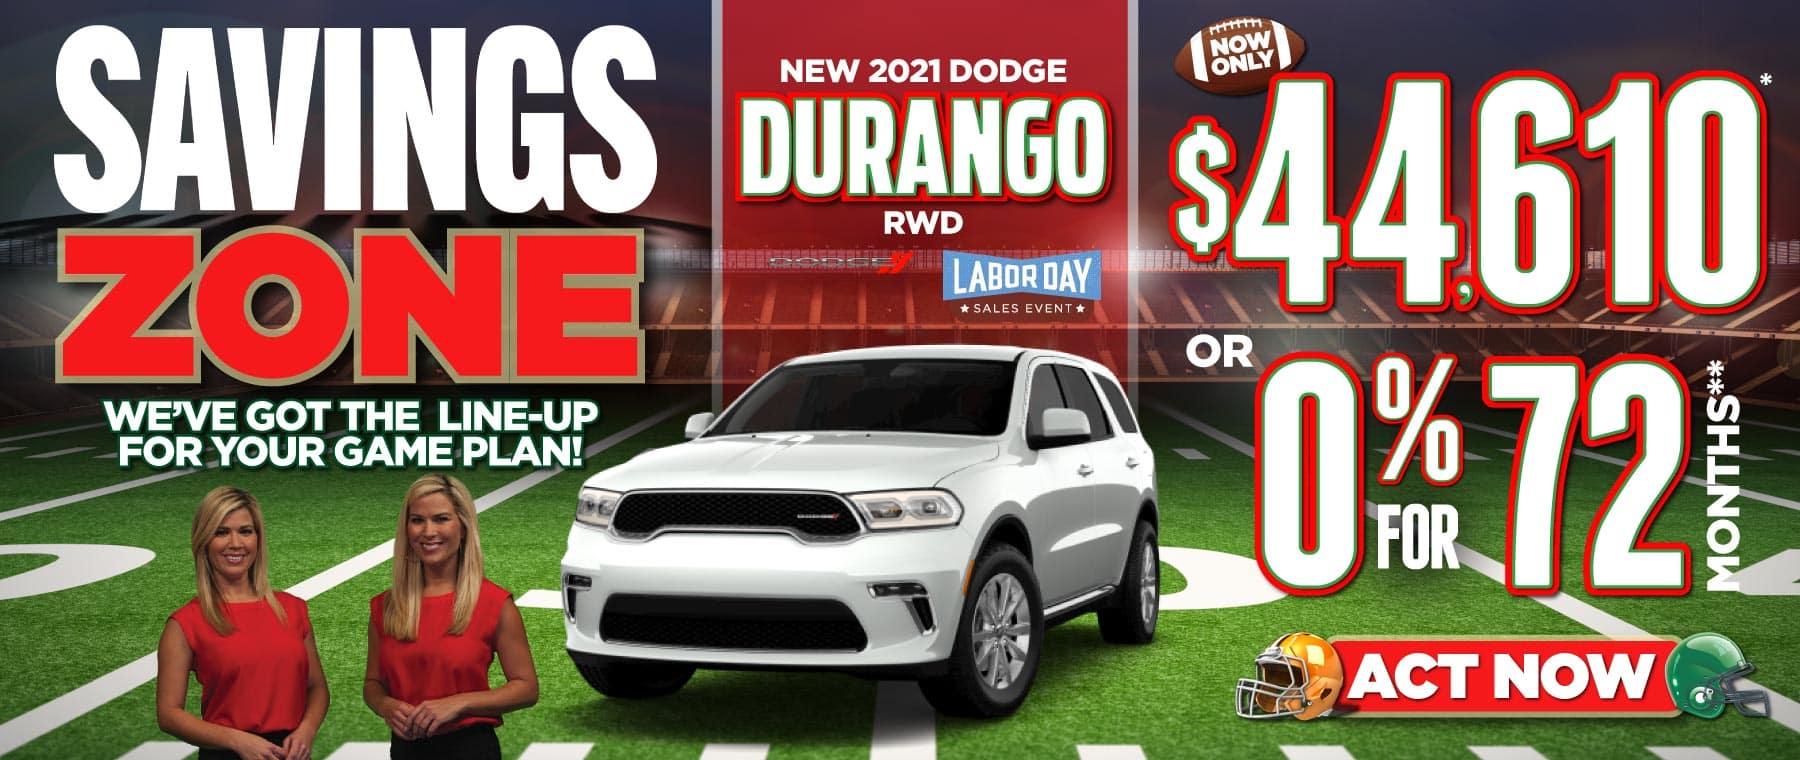 2021 Dodge Durango Now only $44,610   Act Now